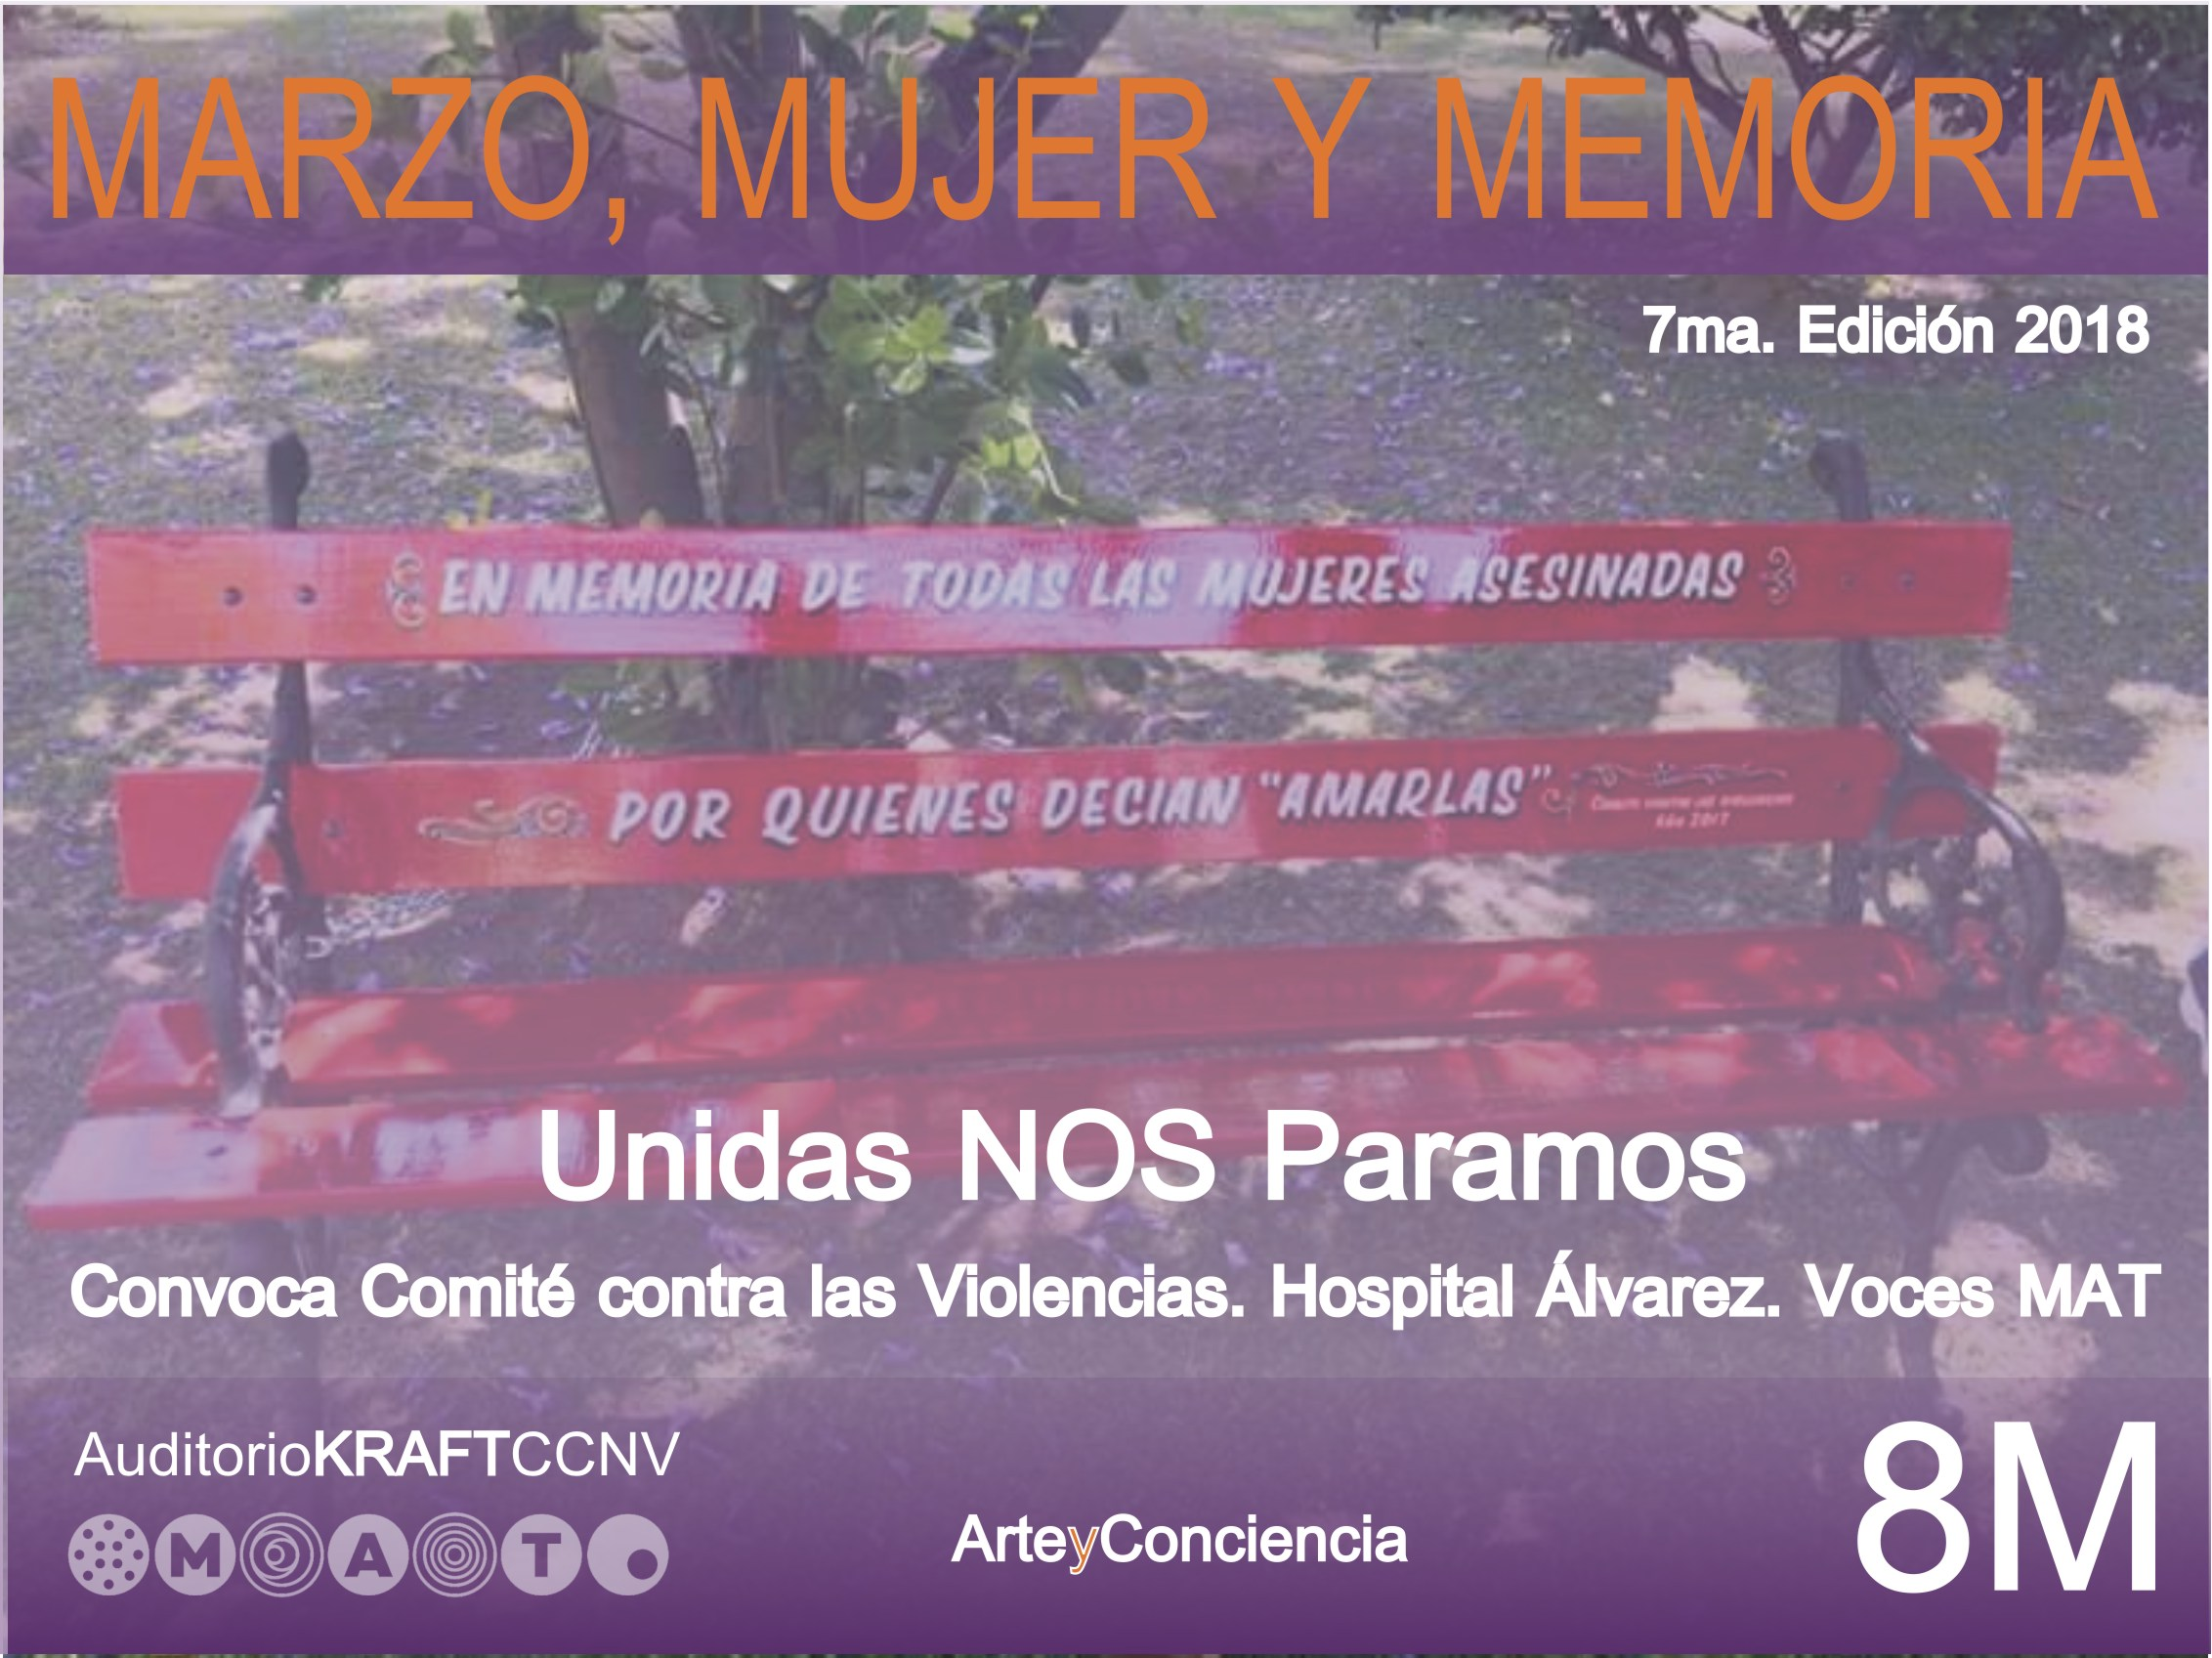 8M_MMM_Hospital_Alvarez.jpg